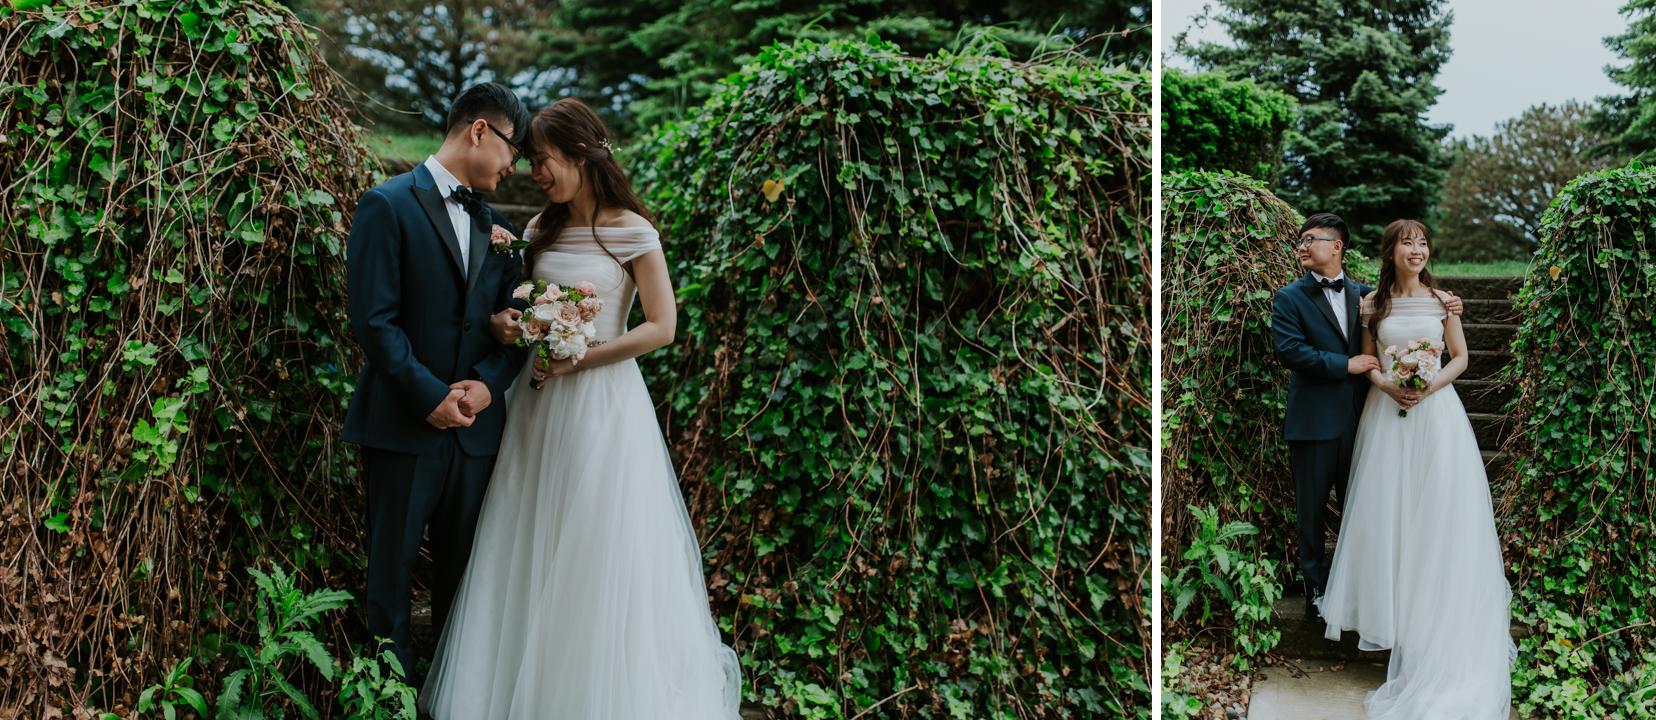 LGP-ann-arbor-eagle-crest-wedding-047.jpg